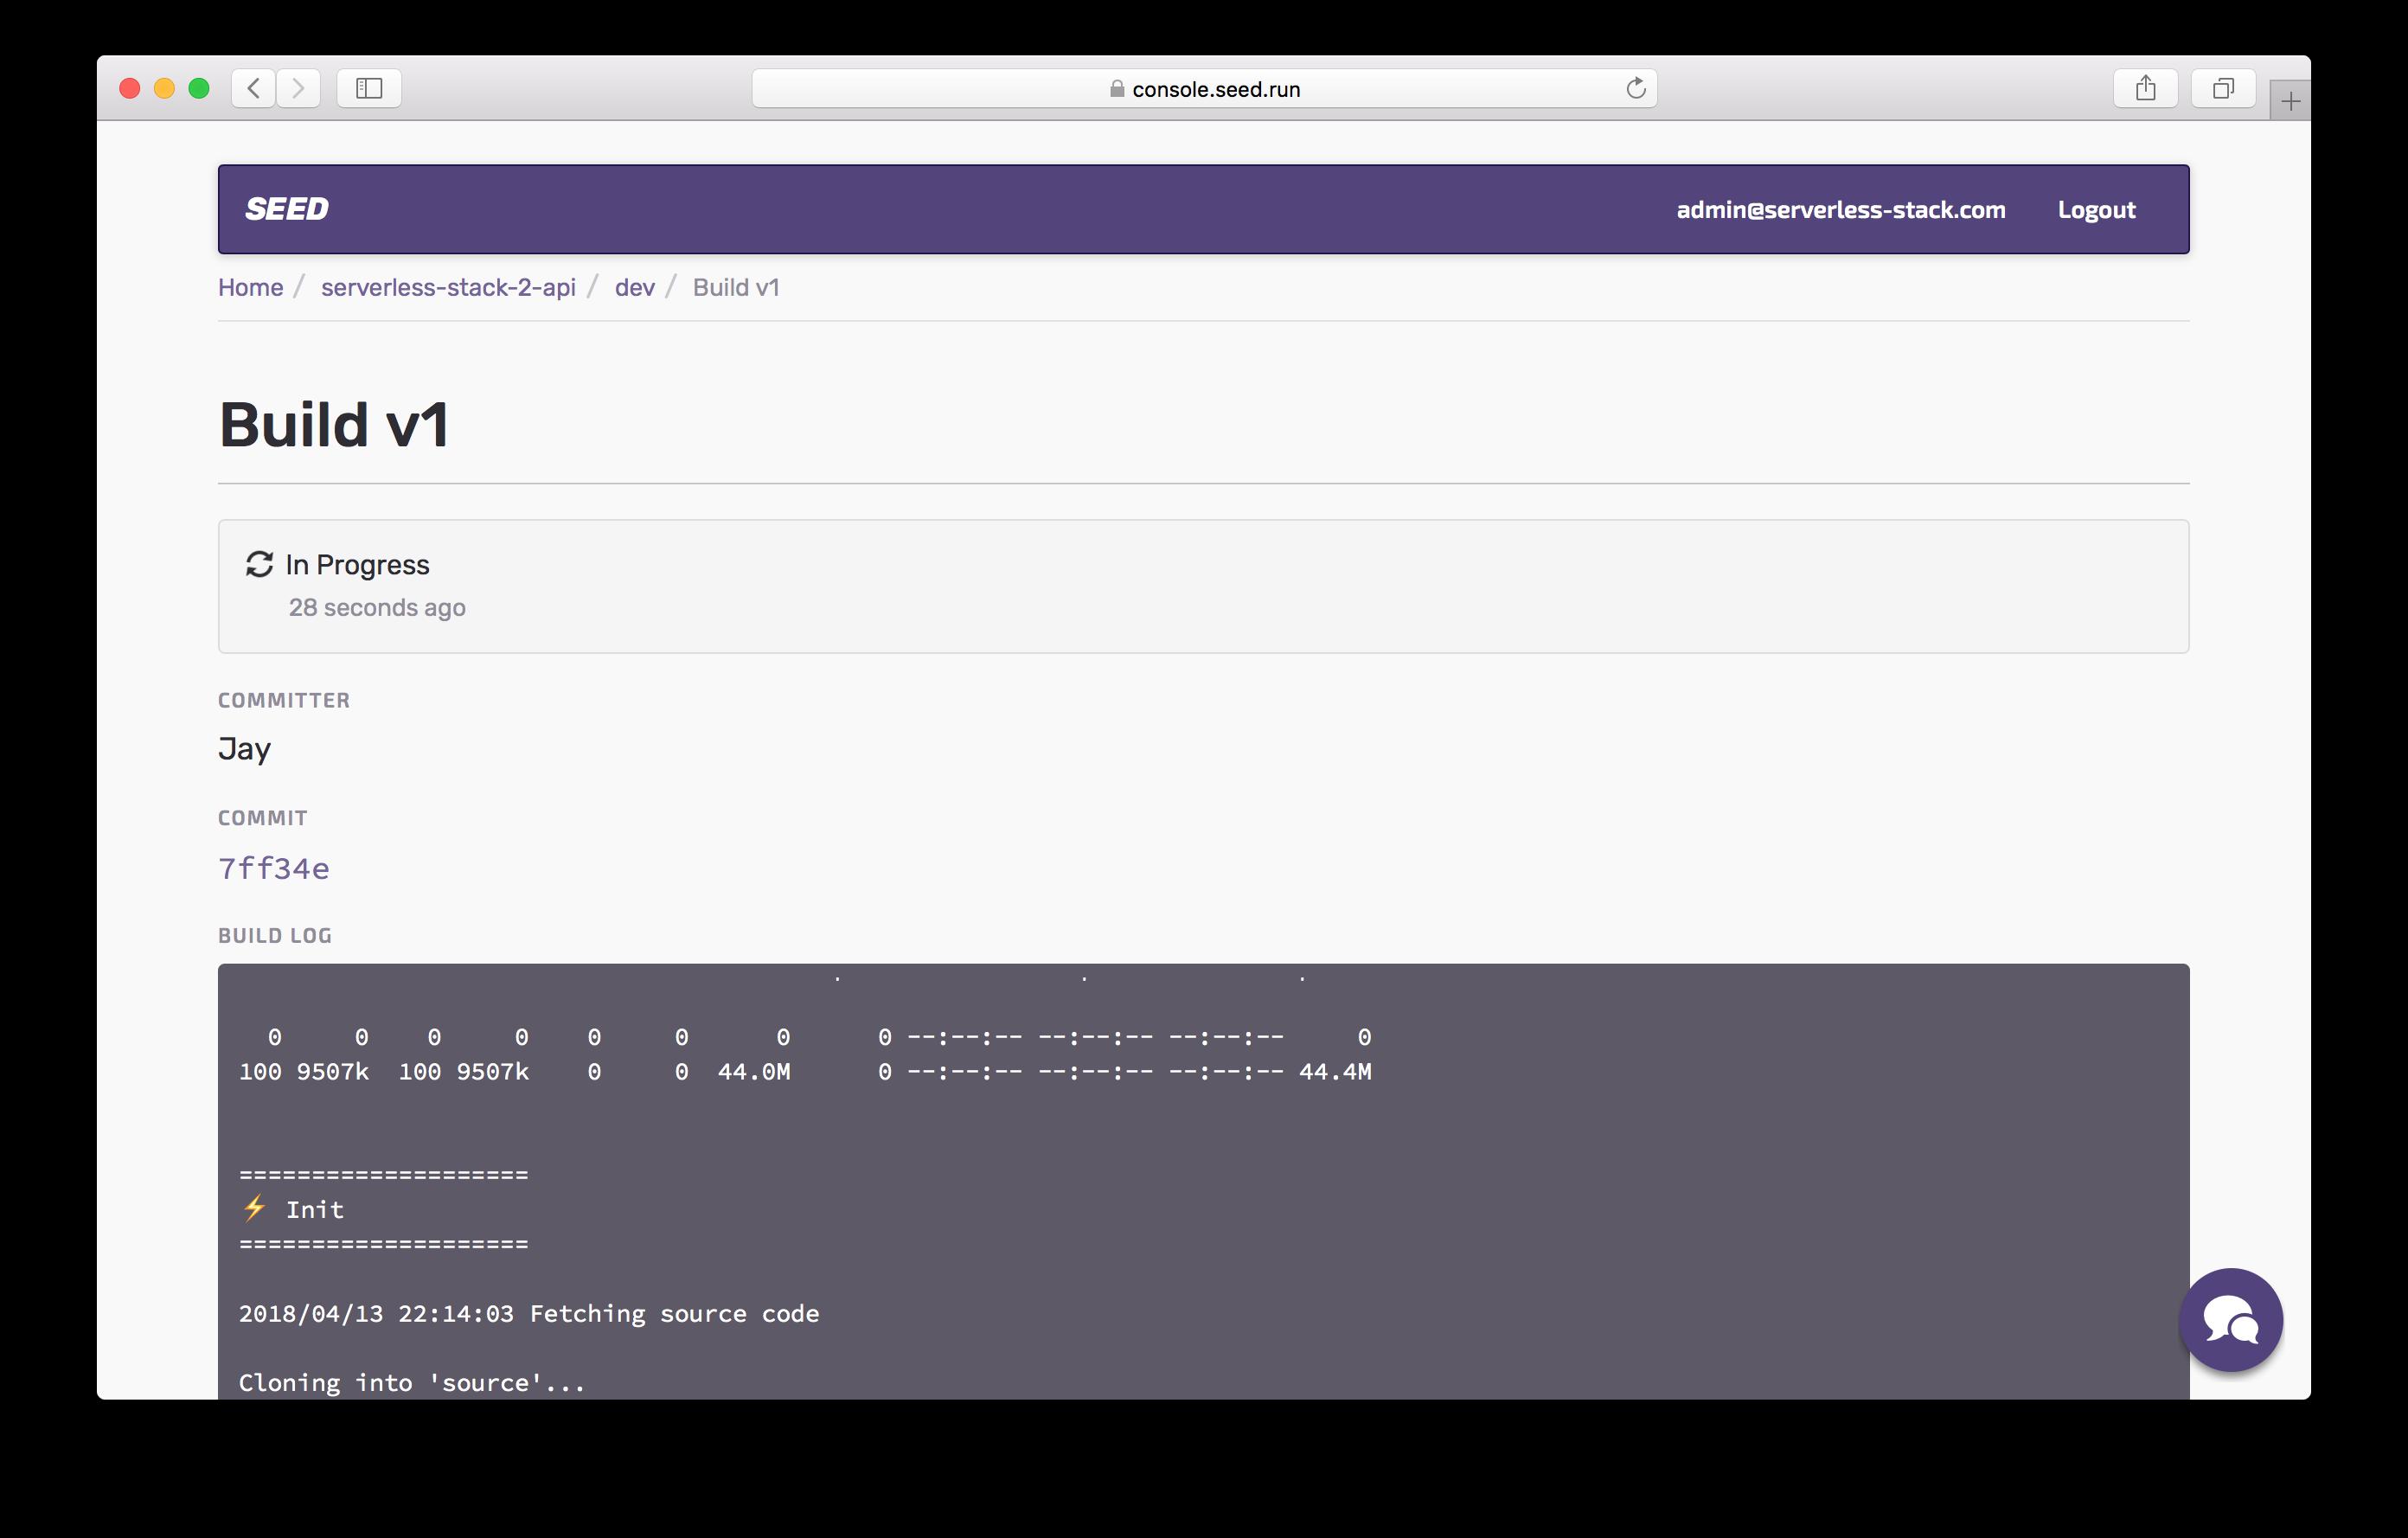 Dev build logs in progress screenshot